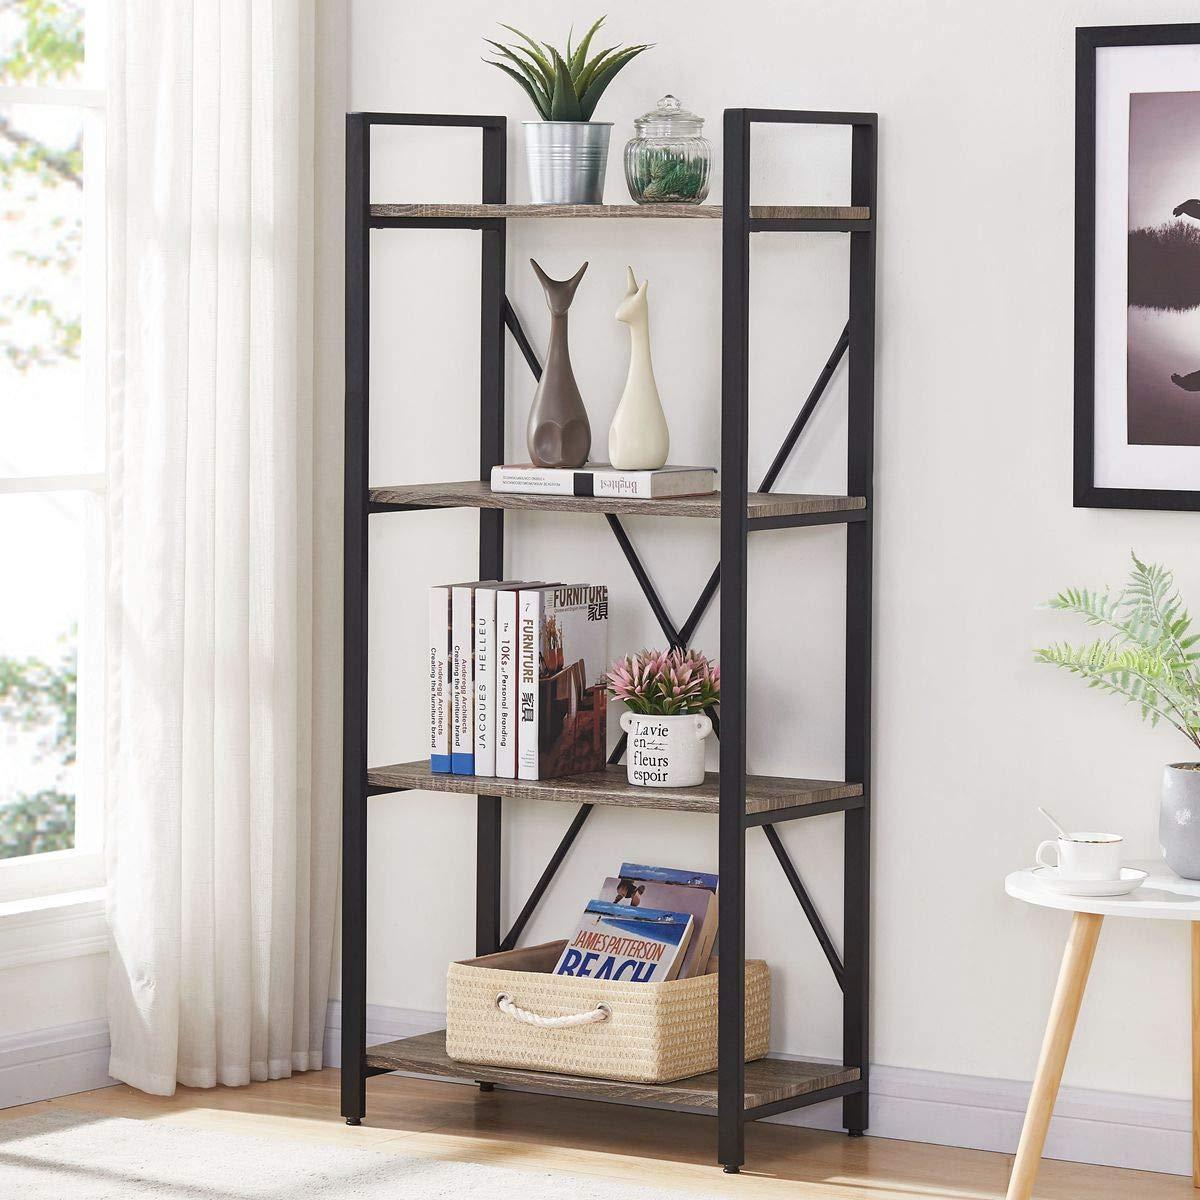 BON AUGURE Bookshelf 4-Tier Shelving Unit Metal Shelves Open Narrow Etagere Bookcase for Office Living Room (Dark Gray Oak) by BON AUGURE